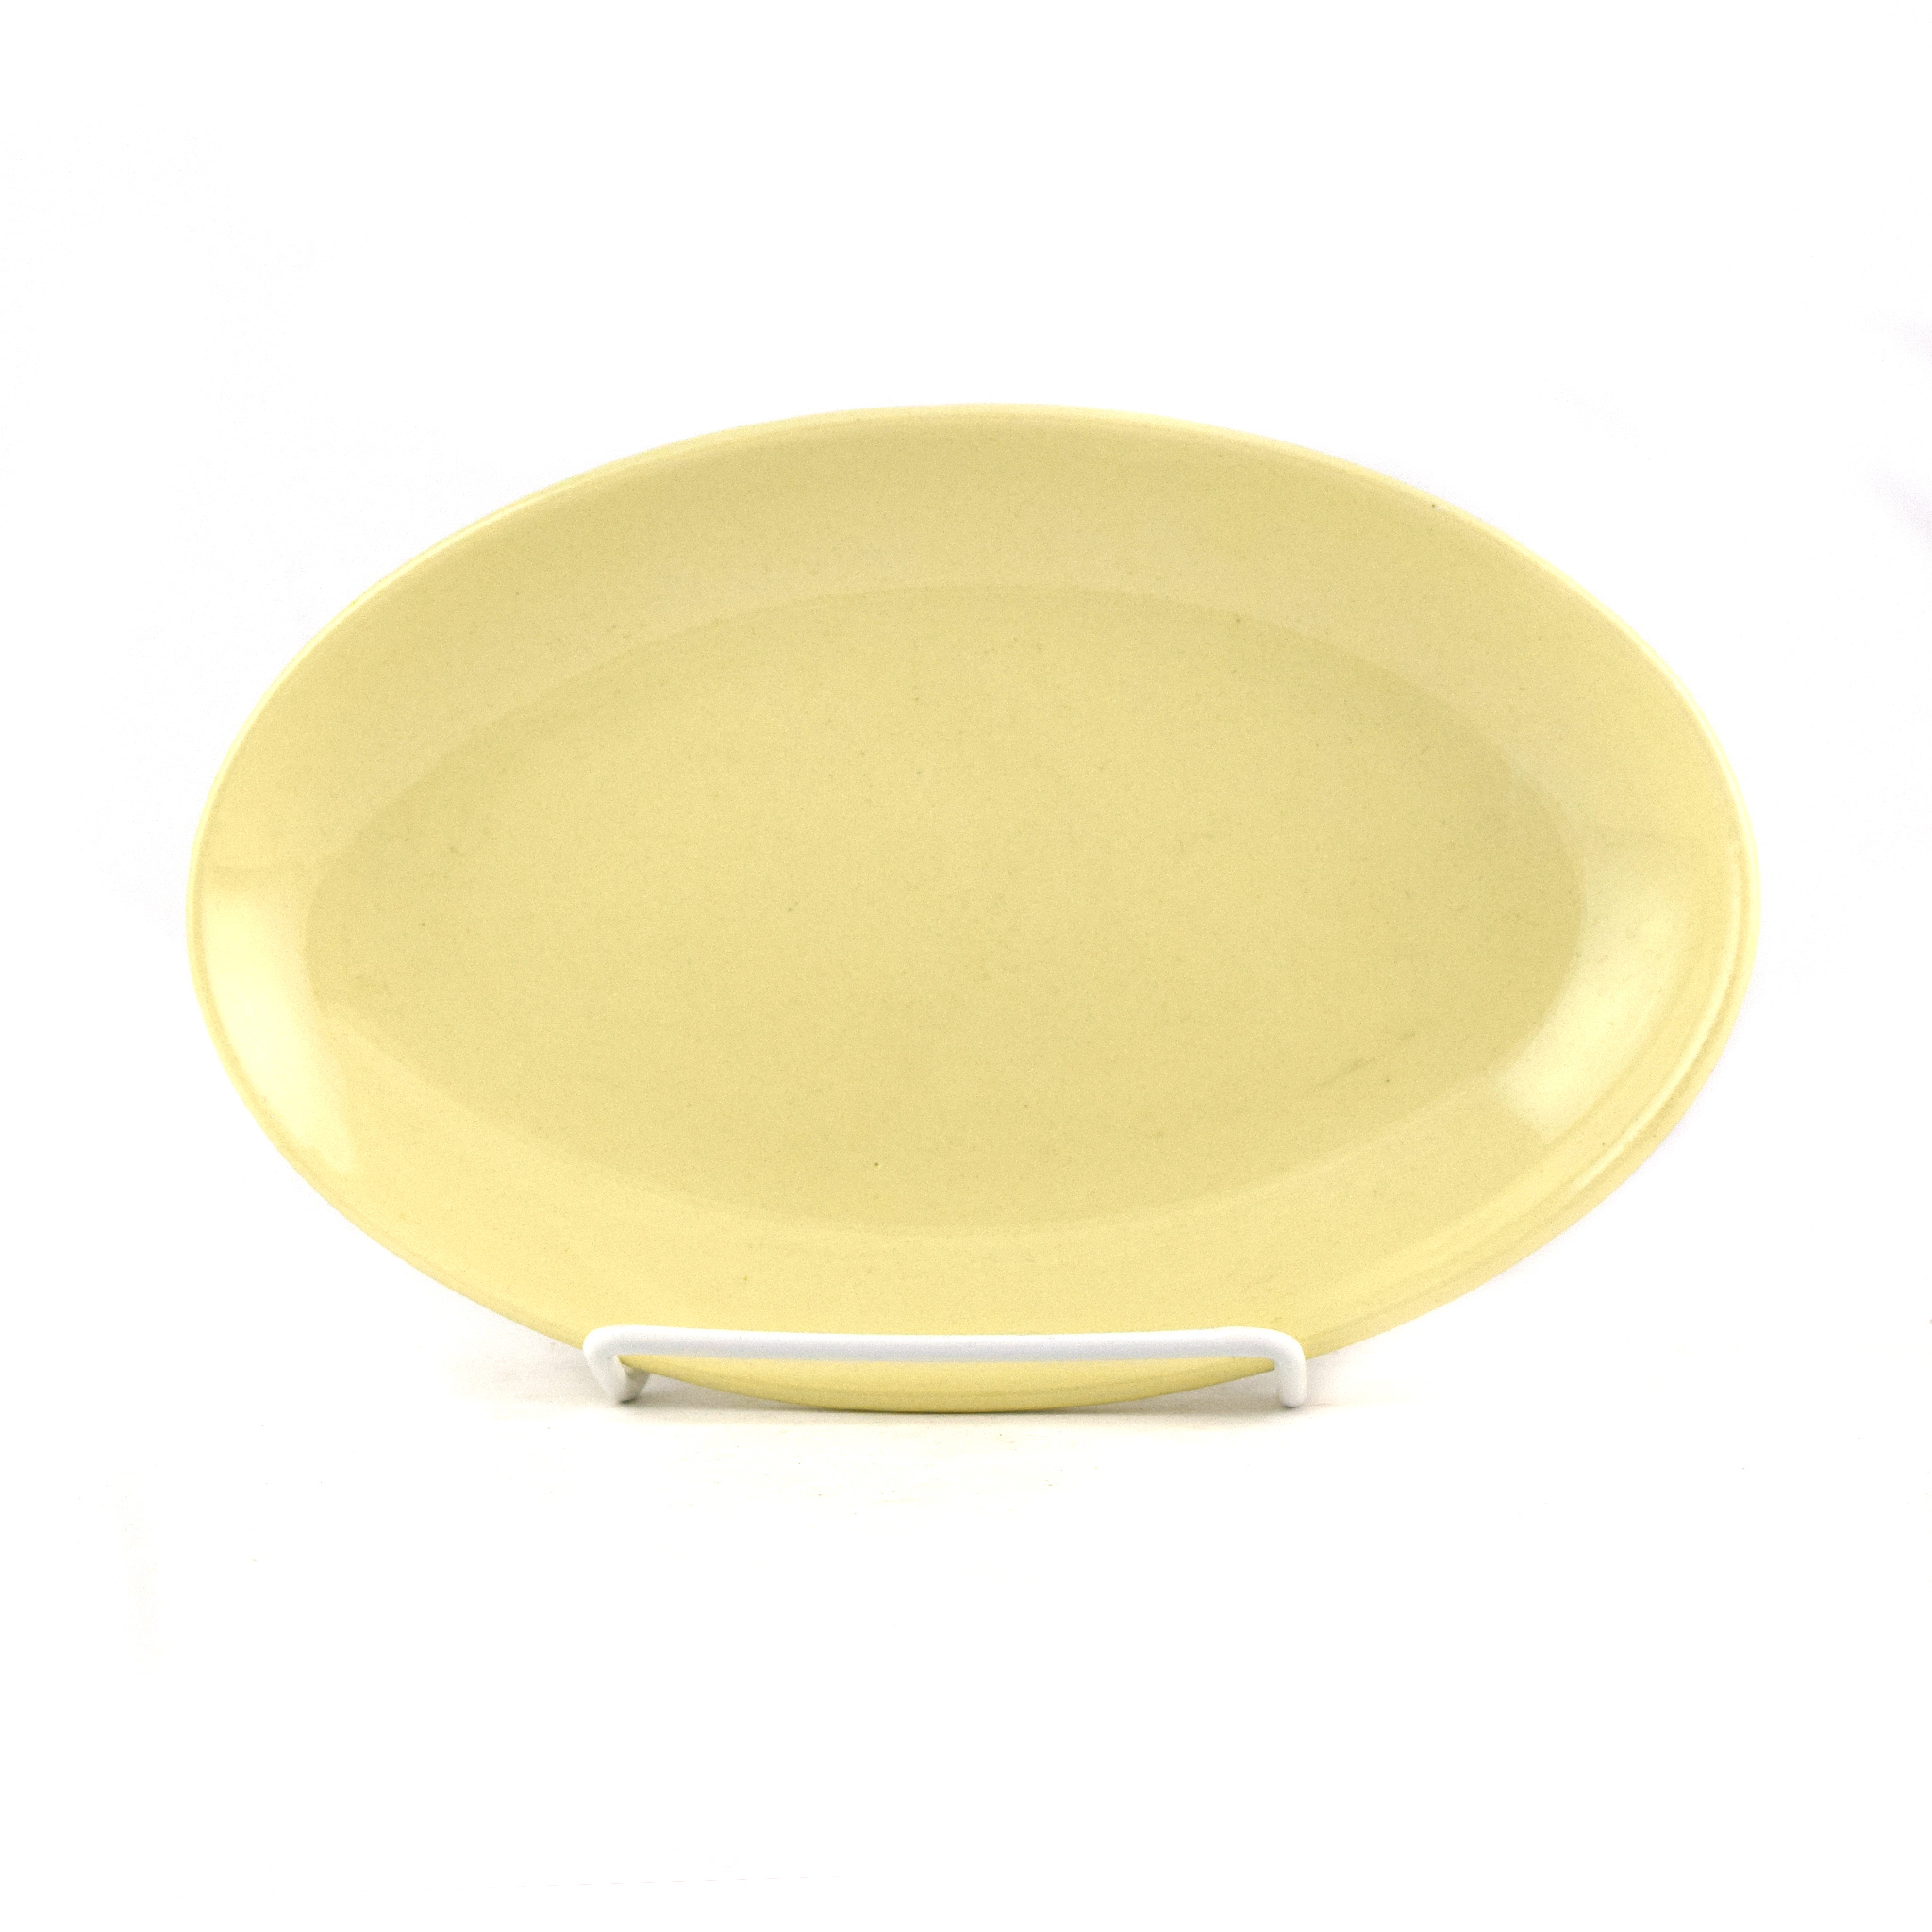 Hycroft Serving Dish